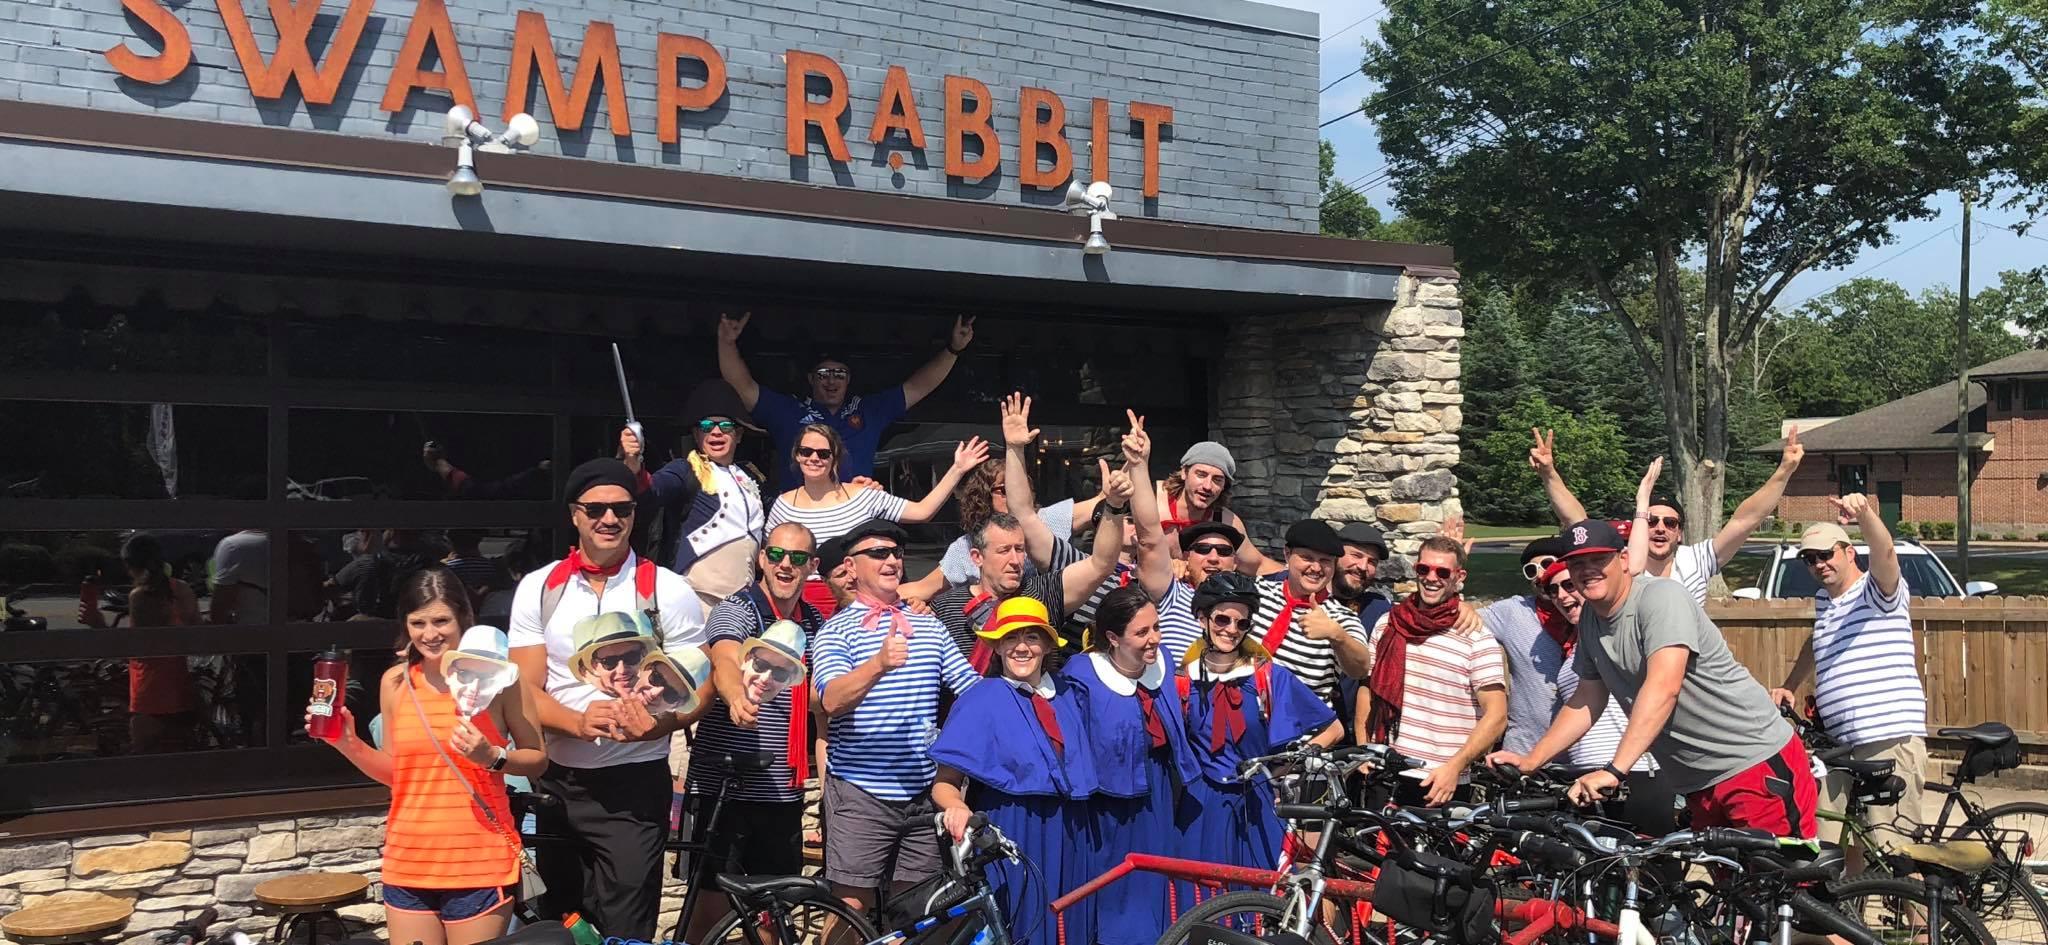 The Annual Tour De Fran Bike Pub Crawl